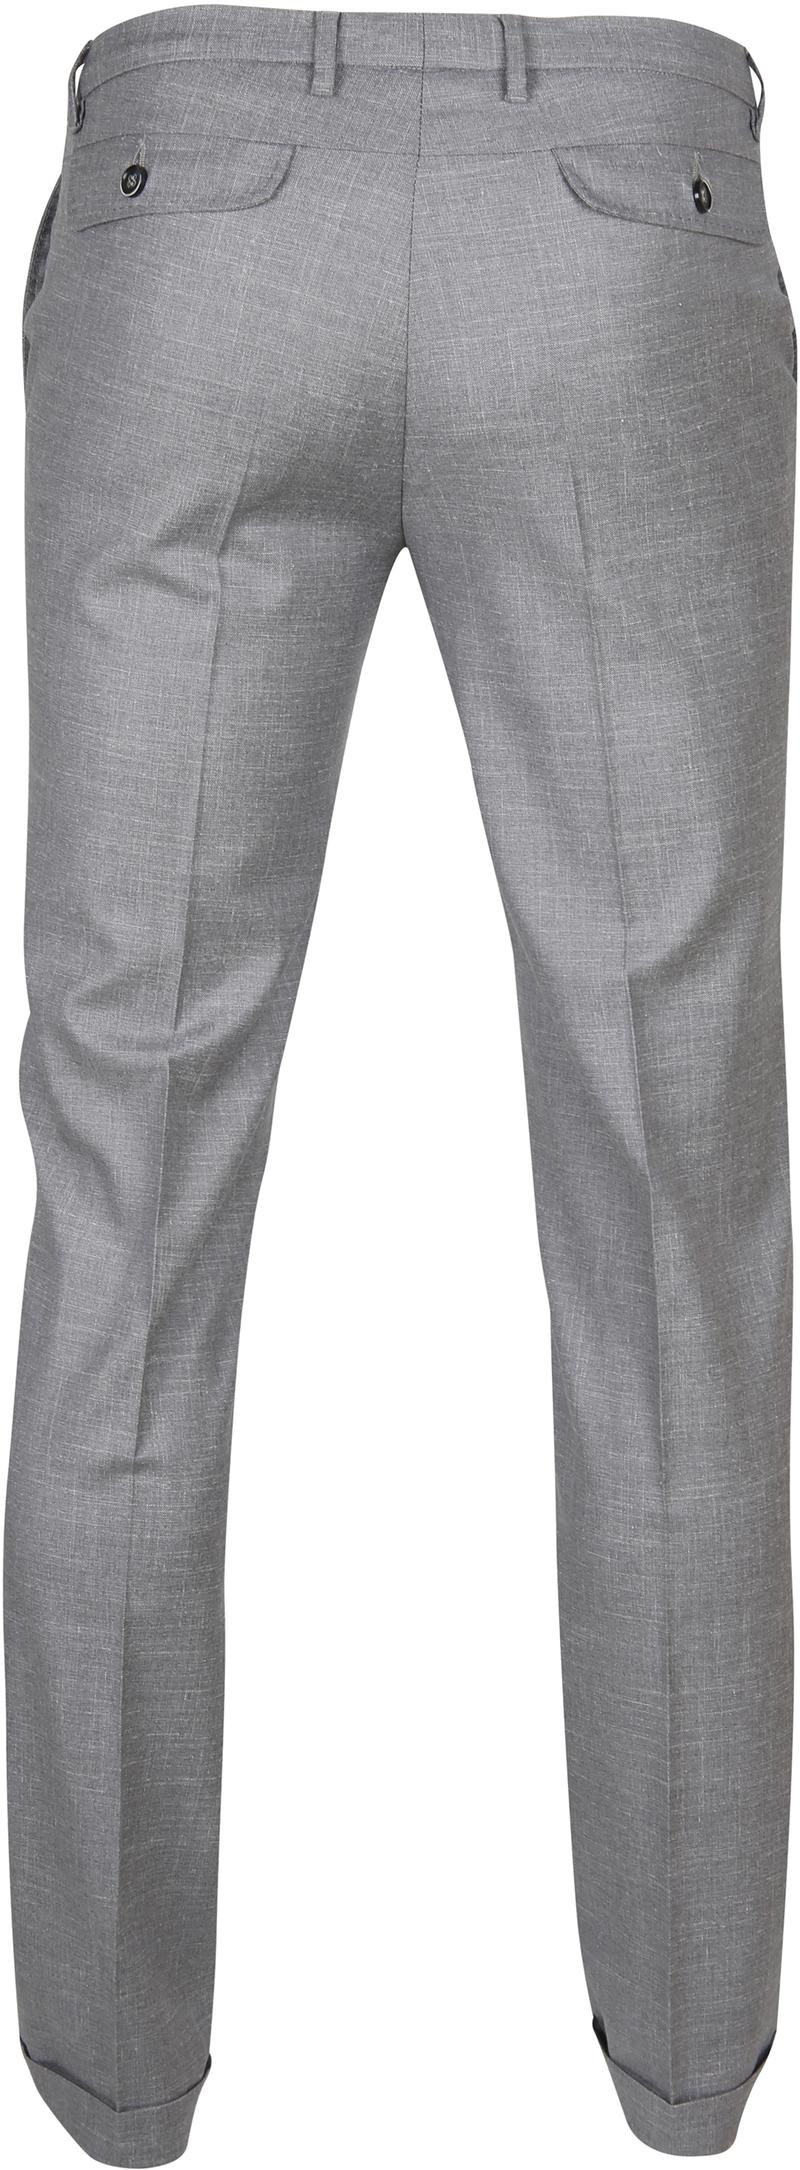 Suitable Pantalon Pisa Melange Grau Foto 5